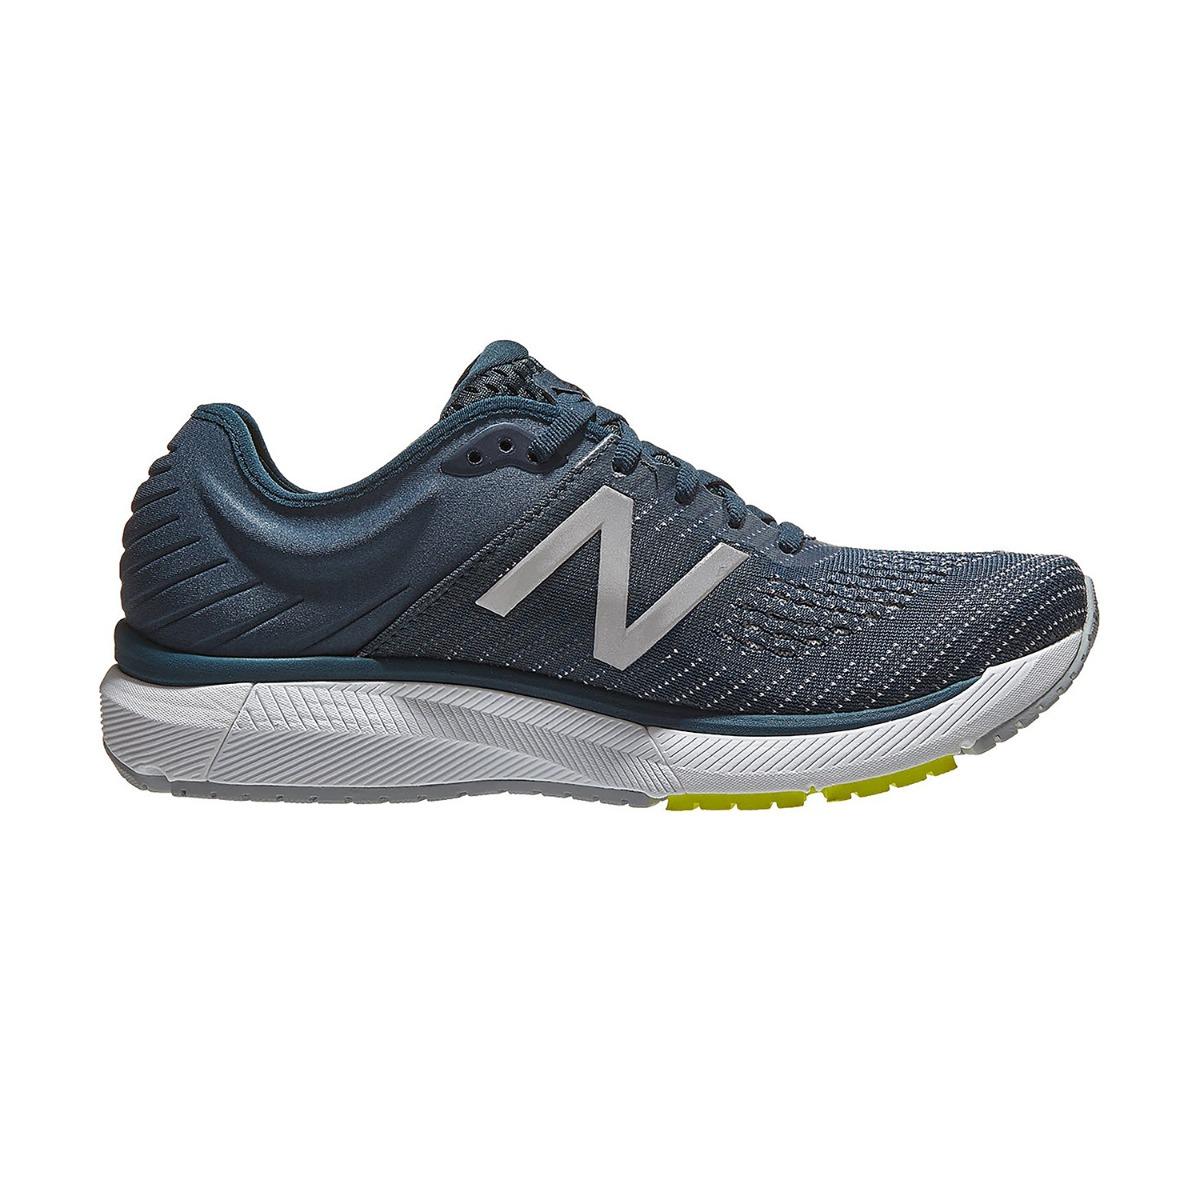 860v10 D Width Running Shoe